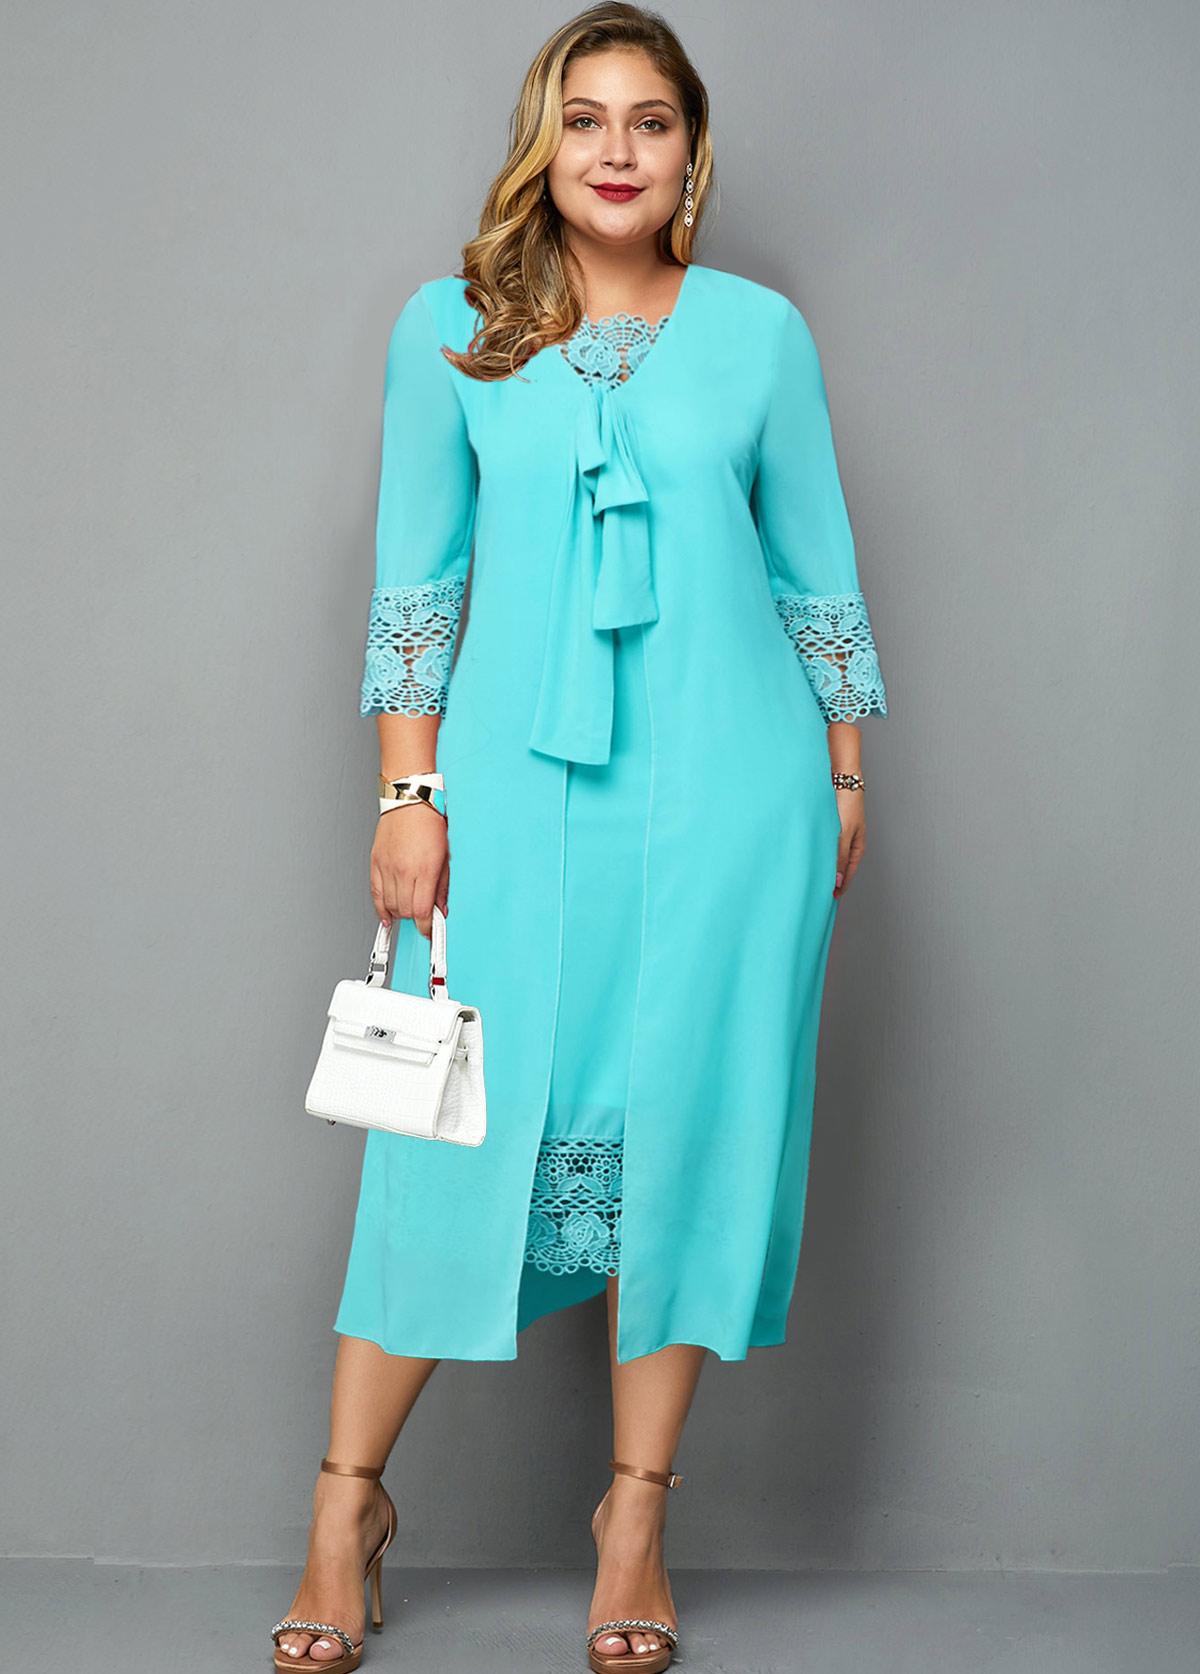 ROTITA Plus Size Knot Detail Lace Panel Dress